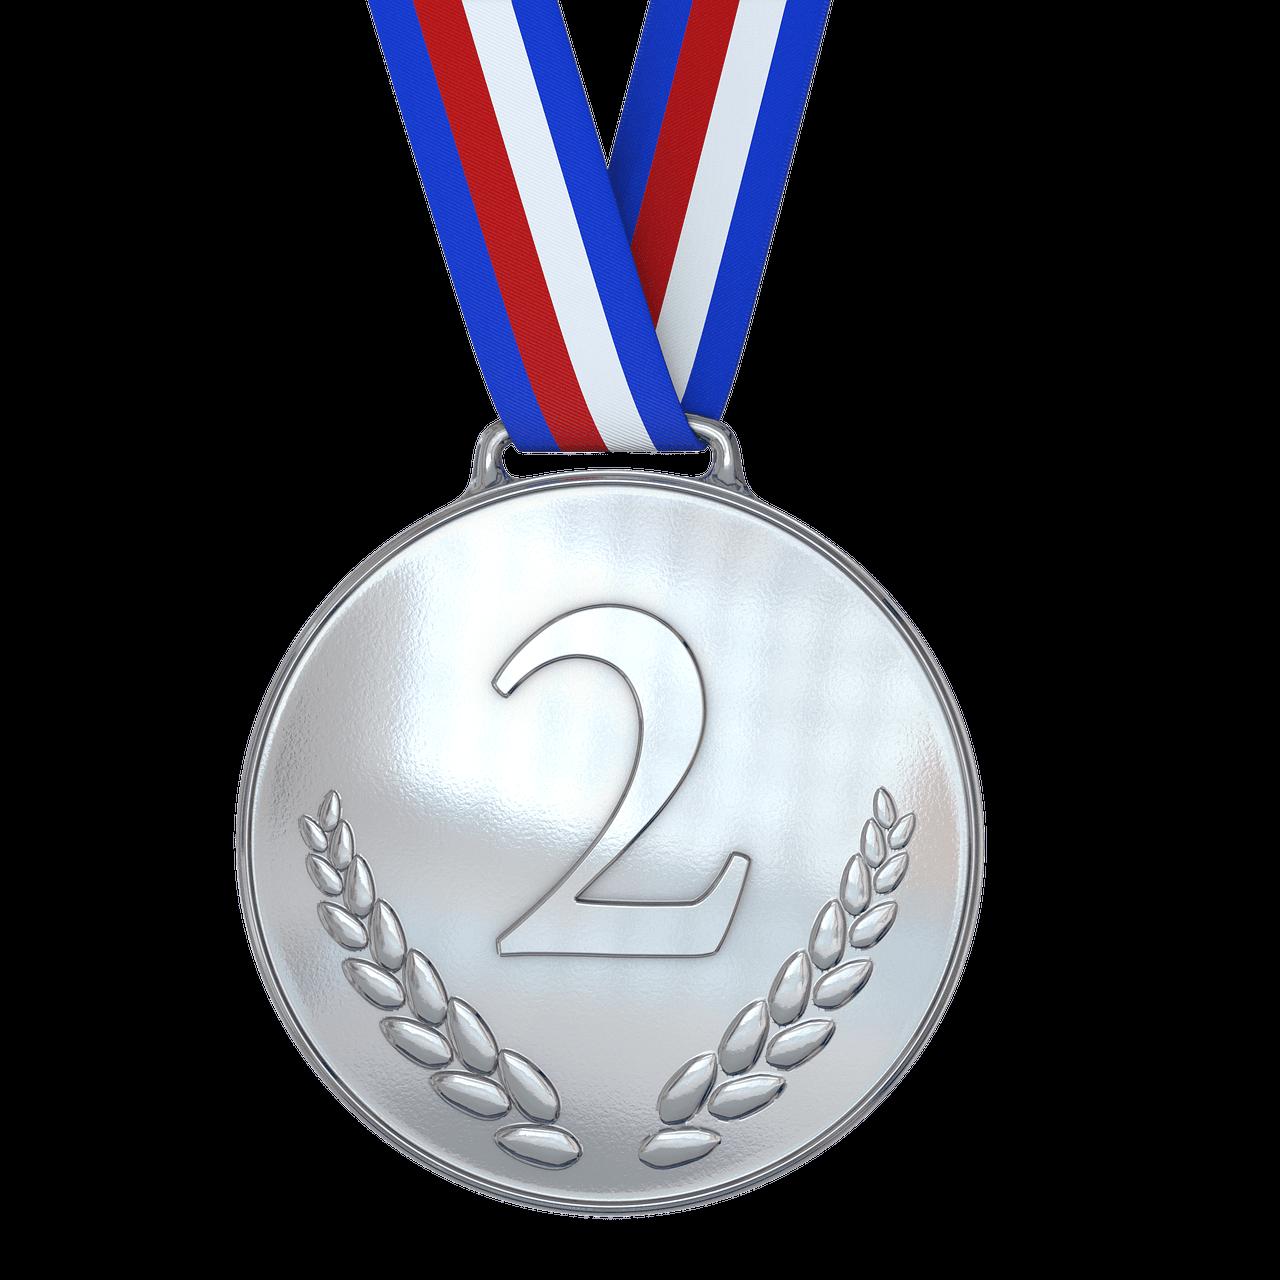 medal, silver, award